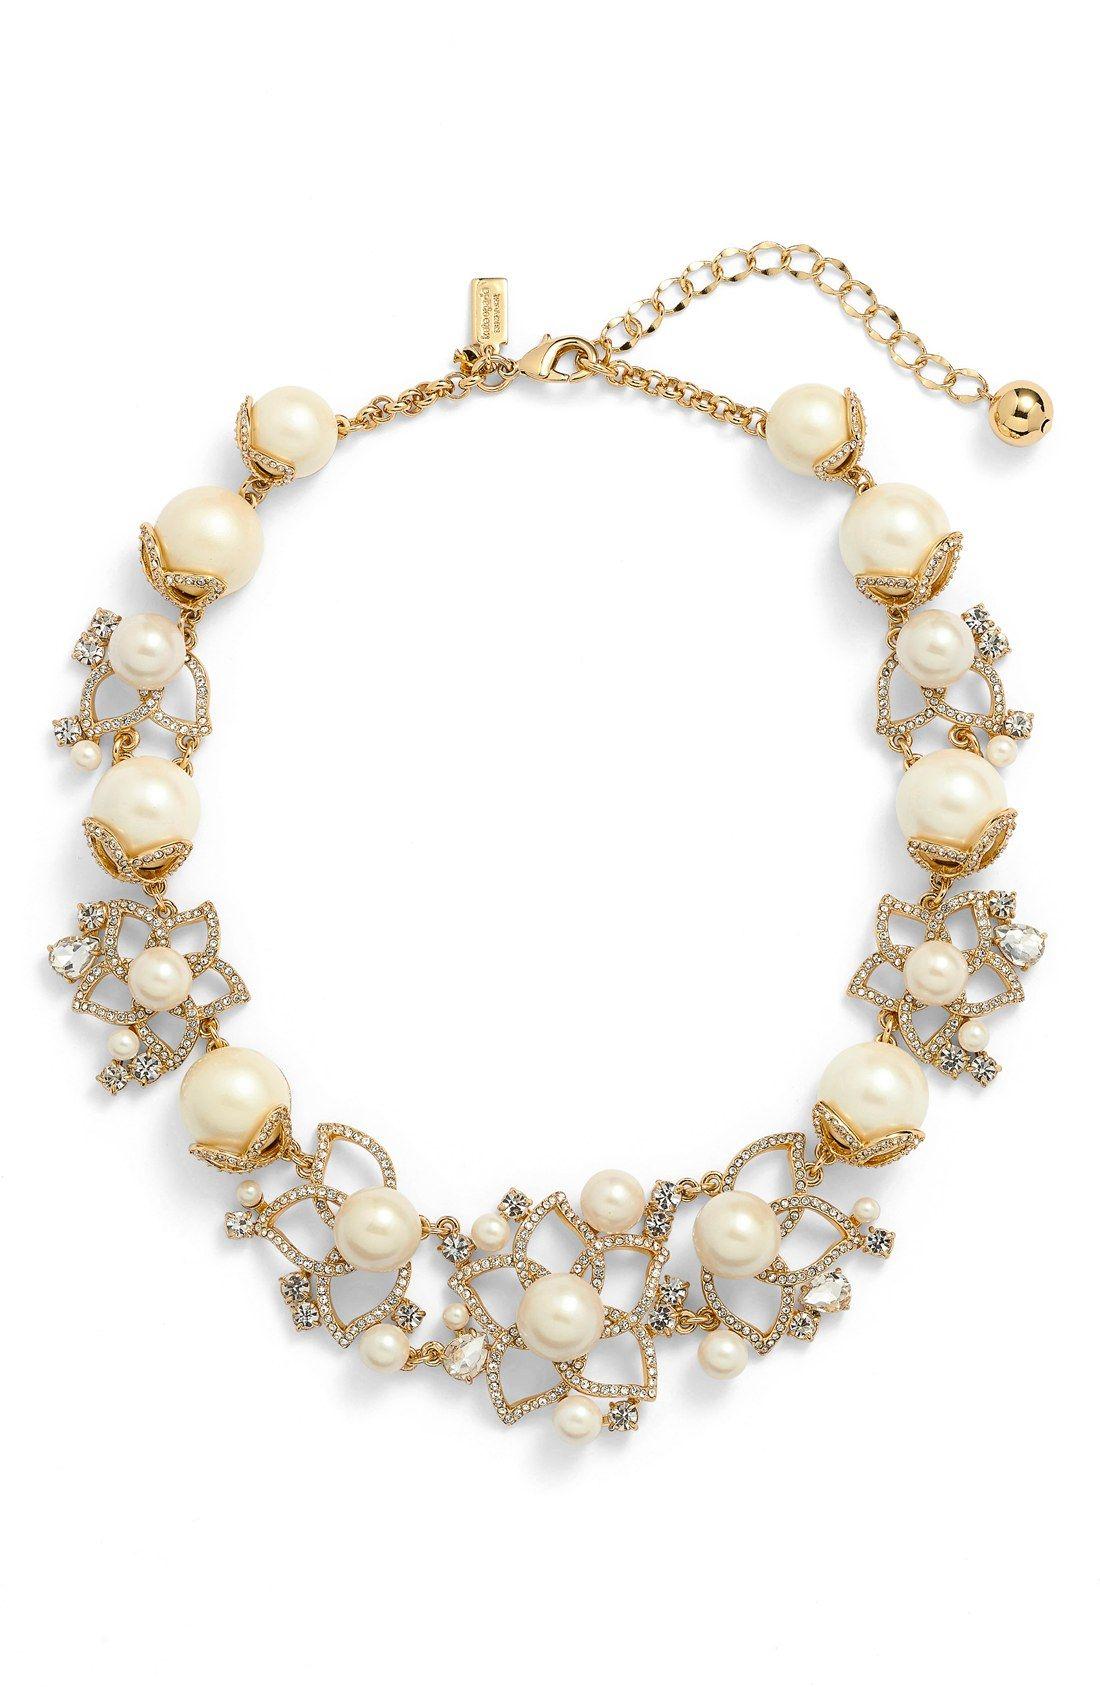 Kate Spade Bridal Necklace  'bouquet' Faux Pearl Statement Necklace